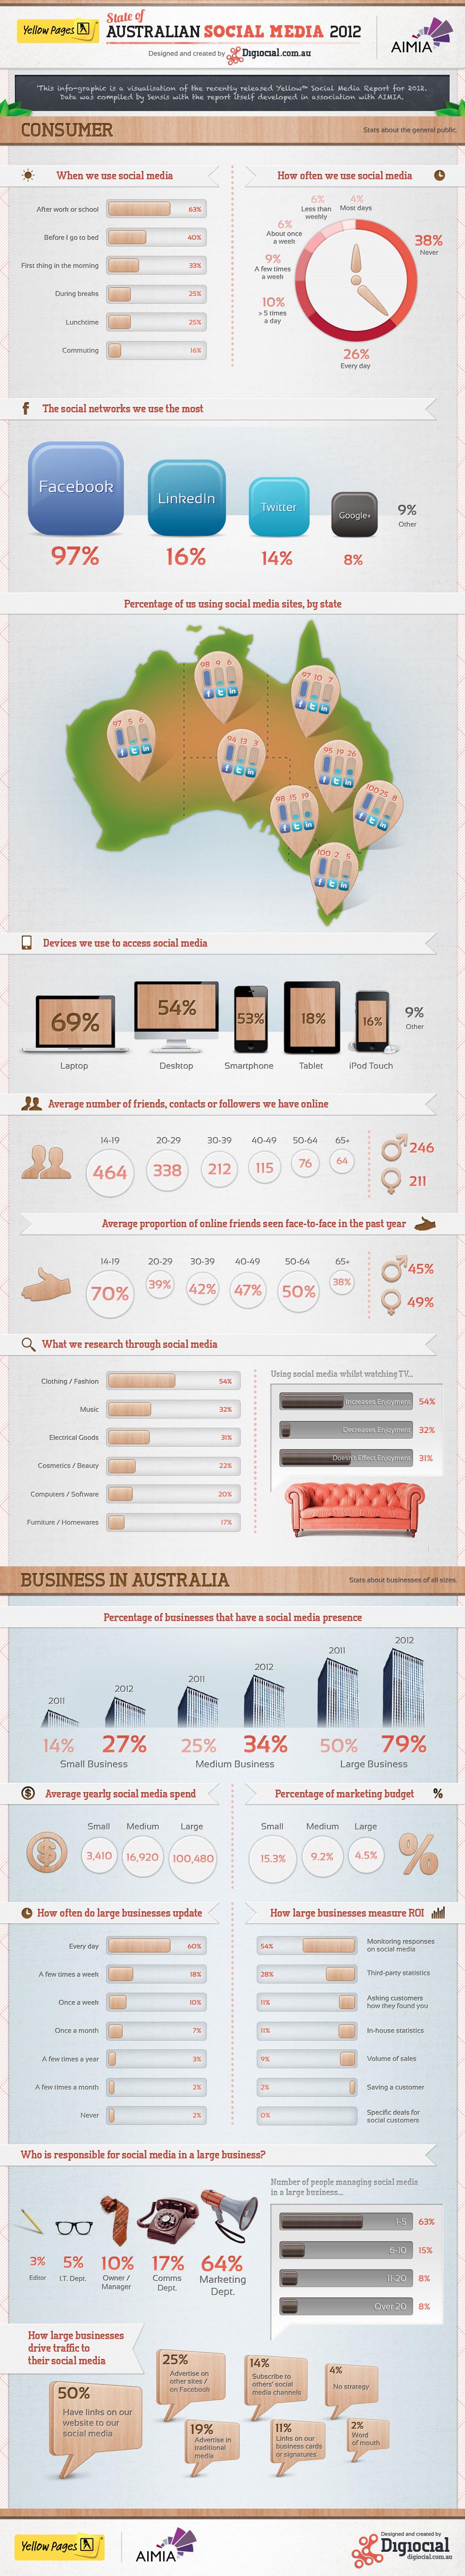 state of australian social media 2012 jonno rodd State of Australian Social Media Infographic 2012